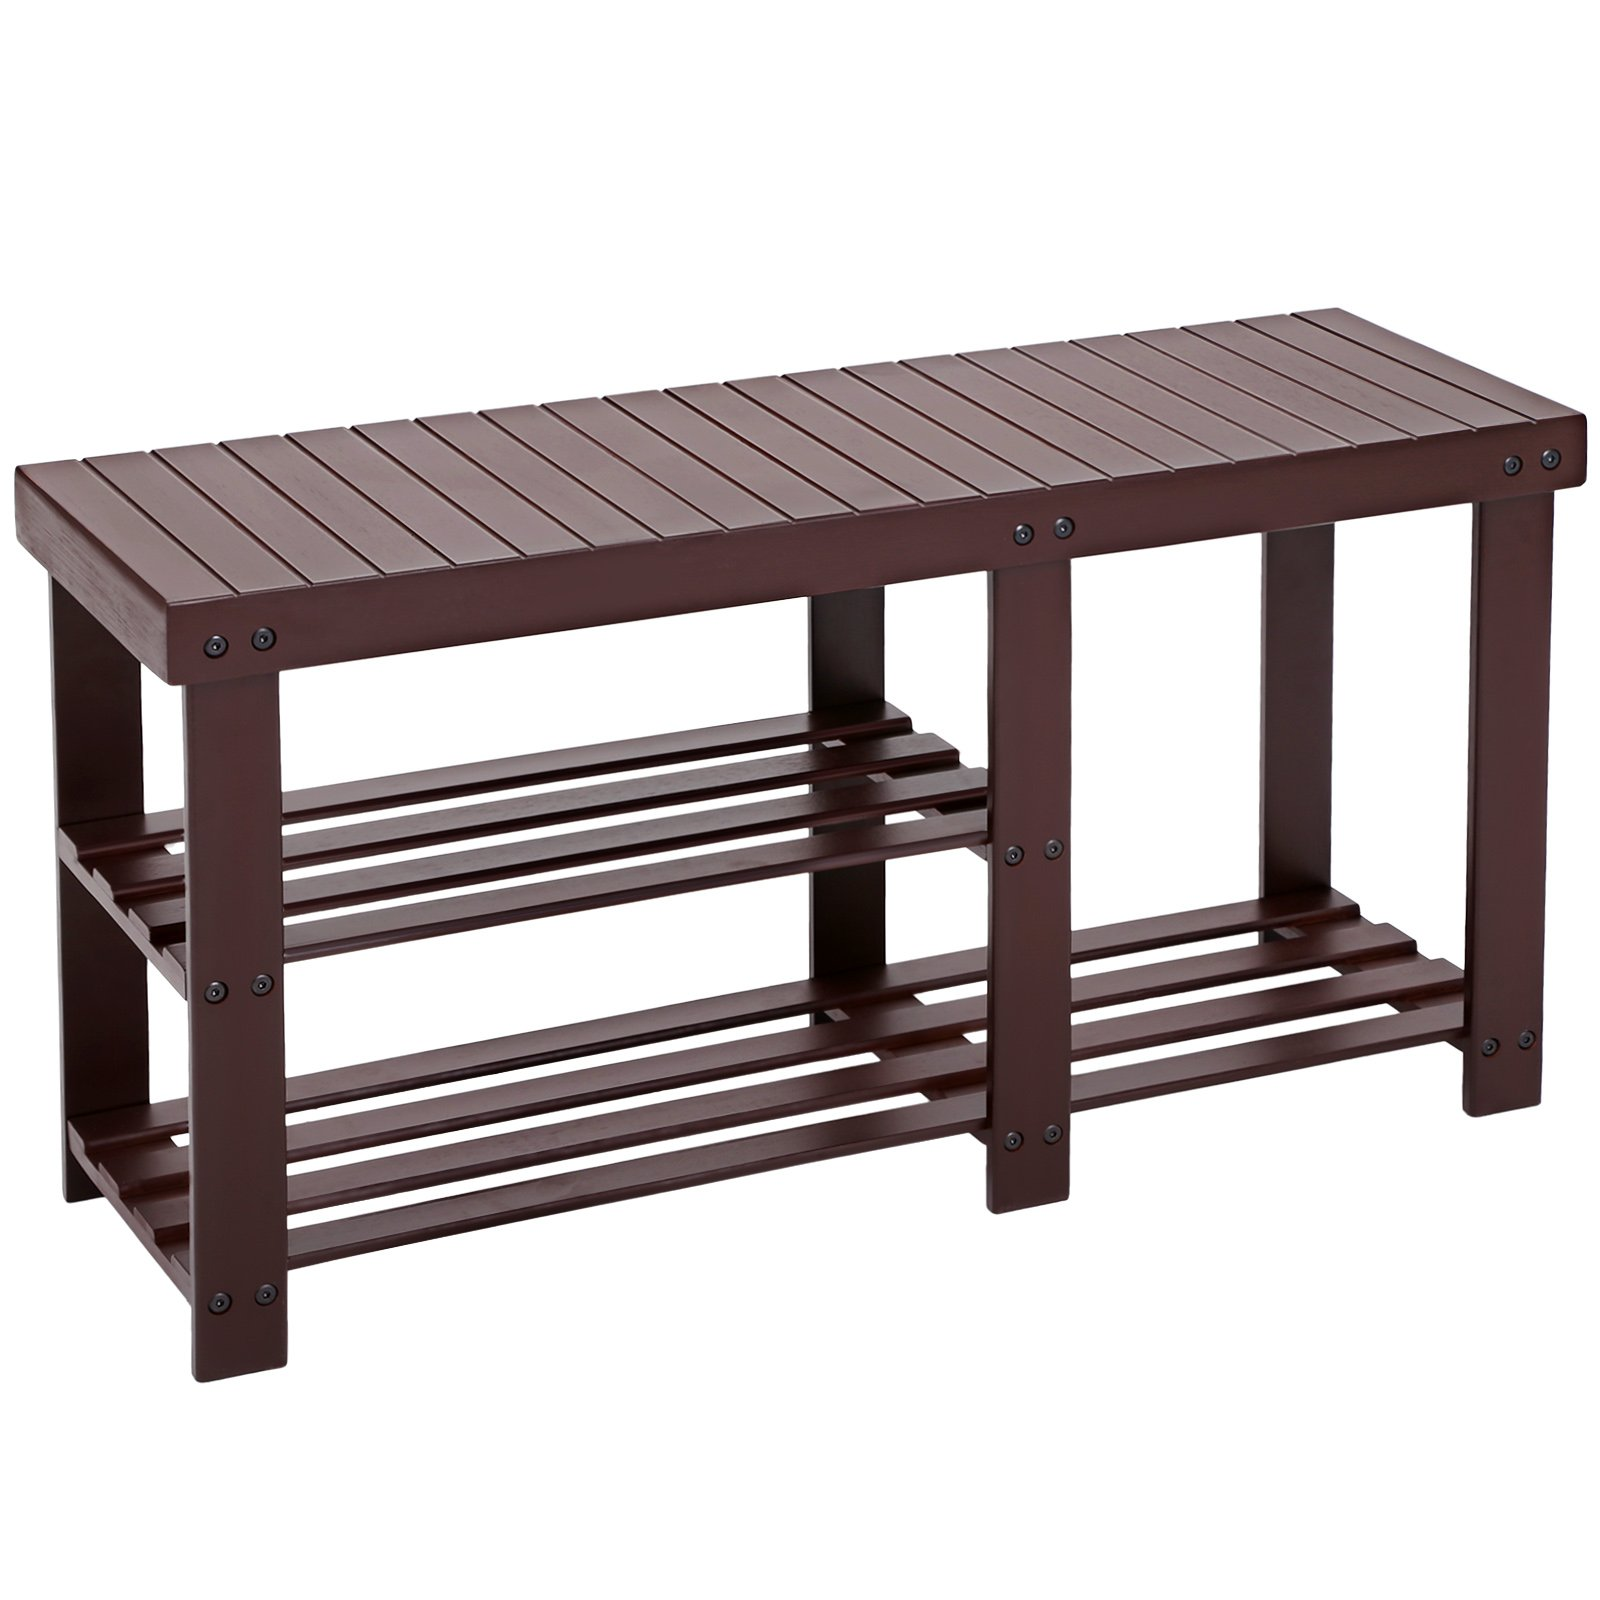 SONGMICS Bamboo Shoe Rack Bench for Boots,Entryway Storage Organizer, 2 Tiers Shoe Shelf,Multi Function for Hallway Bathroom Living Room Corridor and Garden Brown ULBS06Z